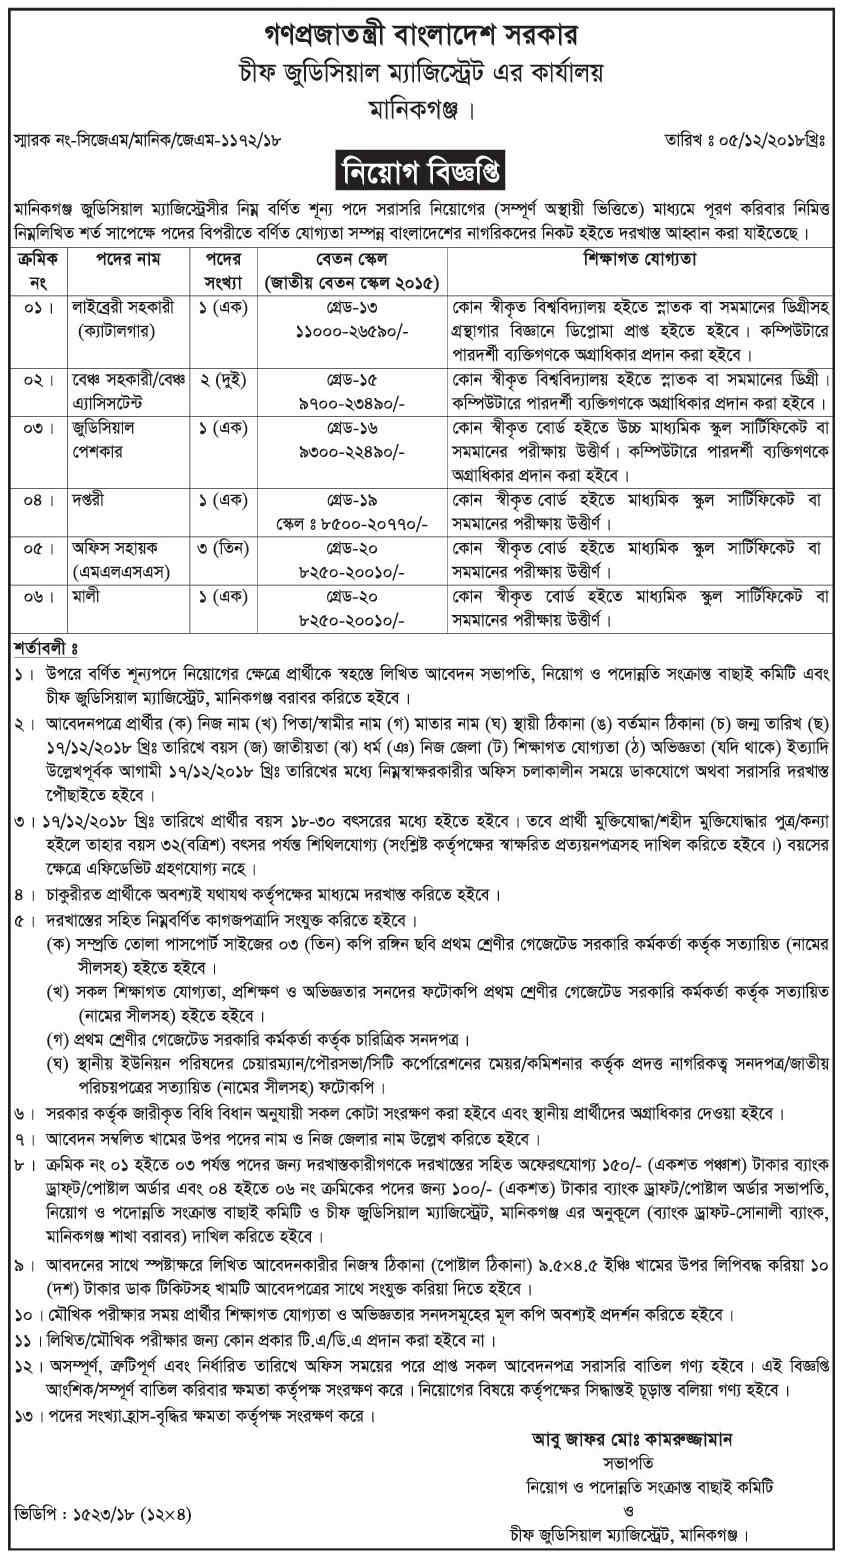 Chief Judicial Magistrate Job Circular 2018